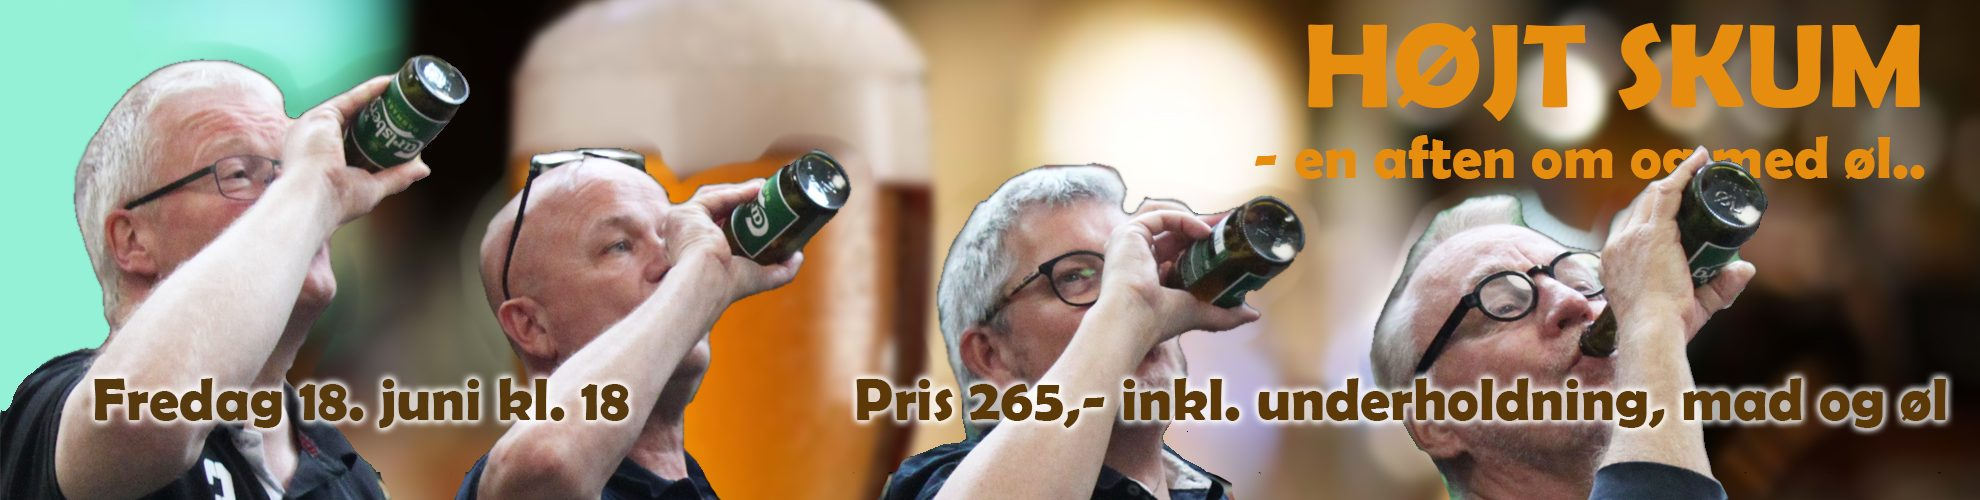 Reklame for ølaften